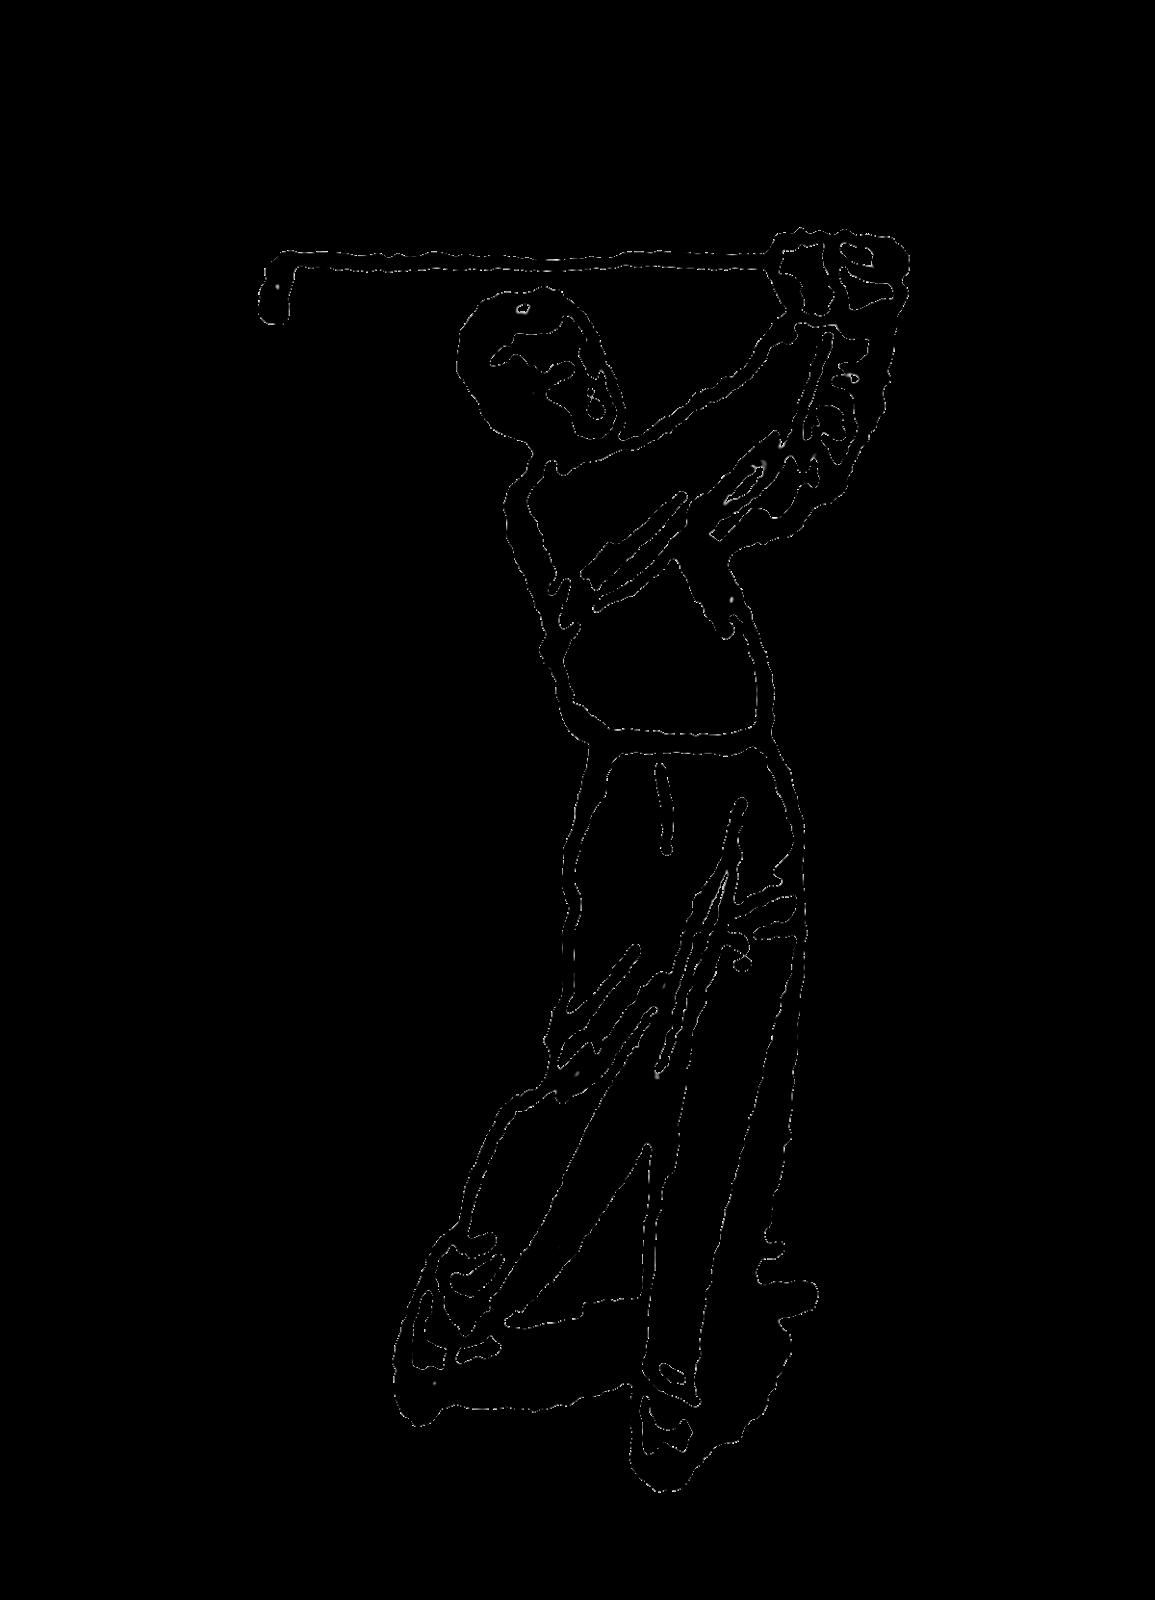 Golfing clipart golf theme. Digital stamp design vintage